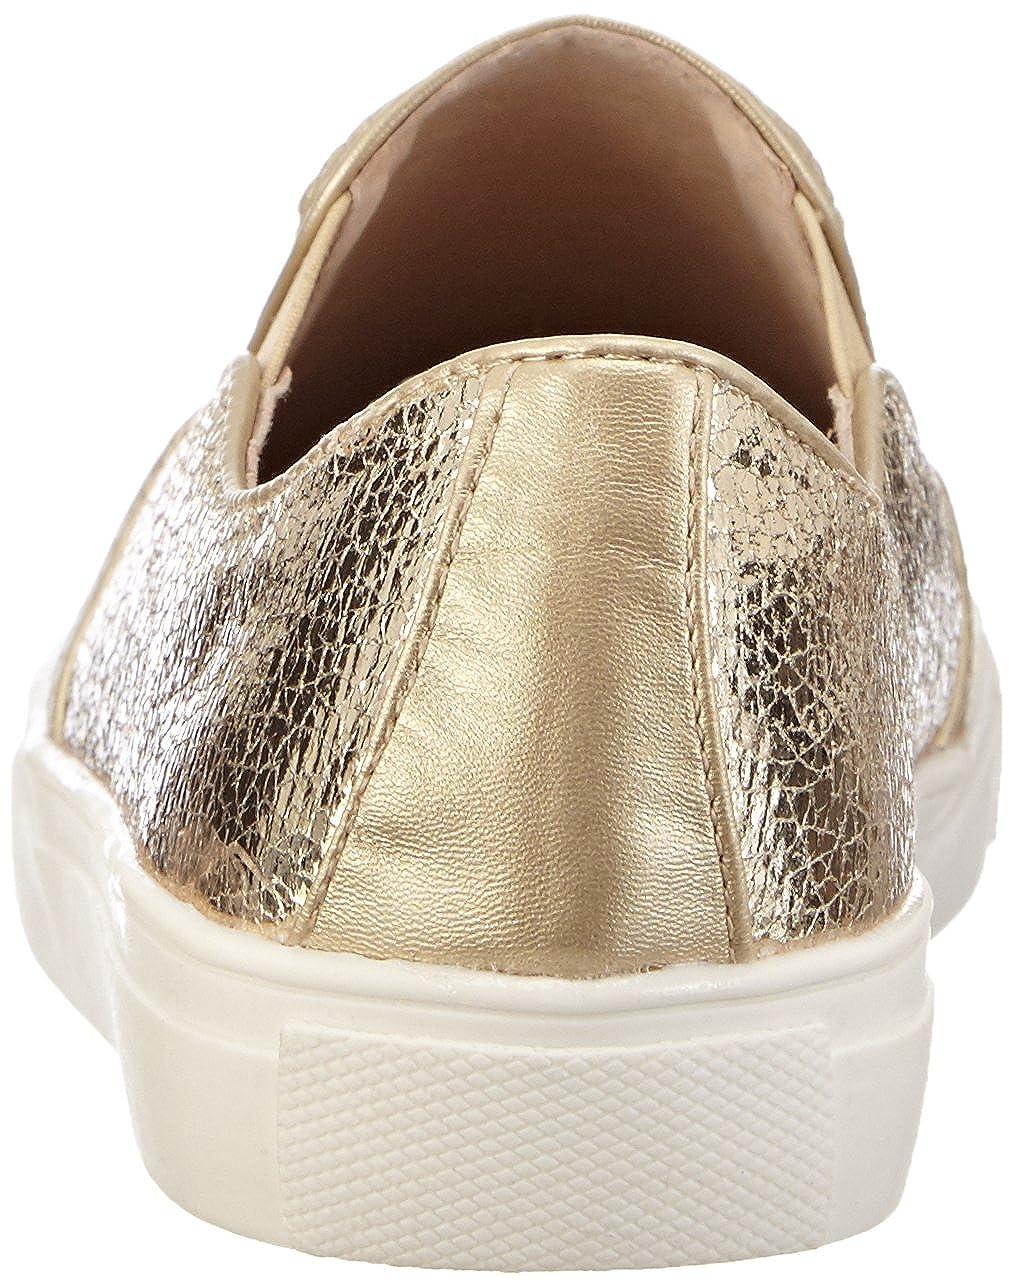 Nat-2 Daily Damen Damen Damen Slipper Gold (Gold) b3b35b